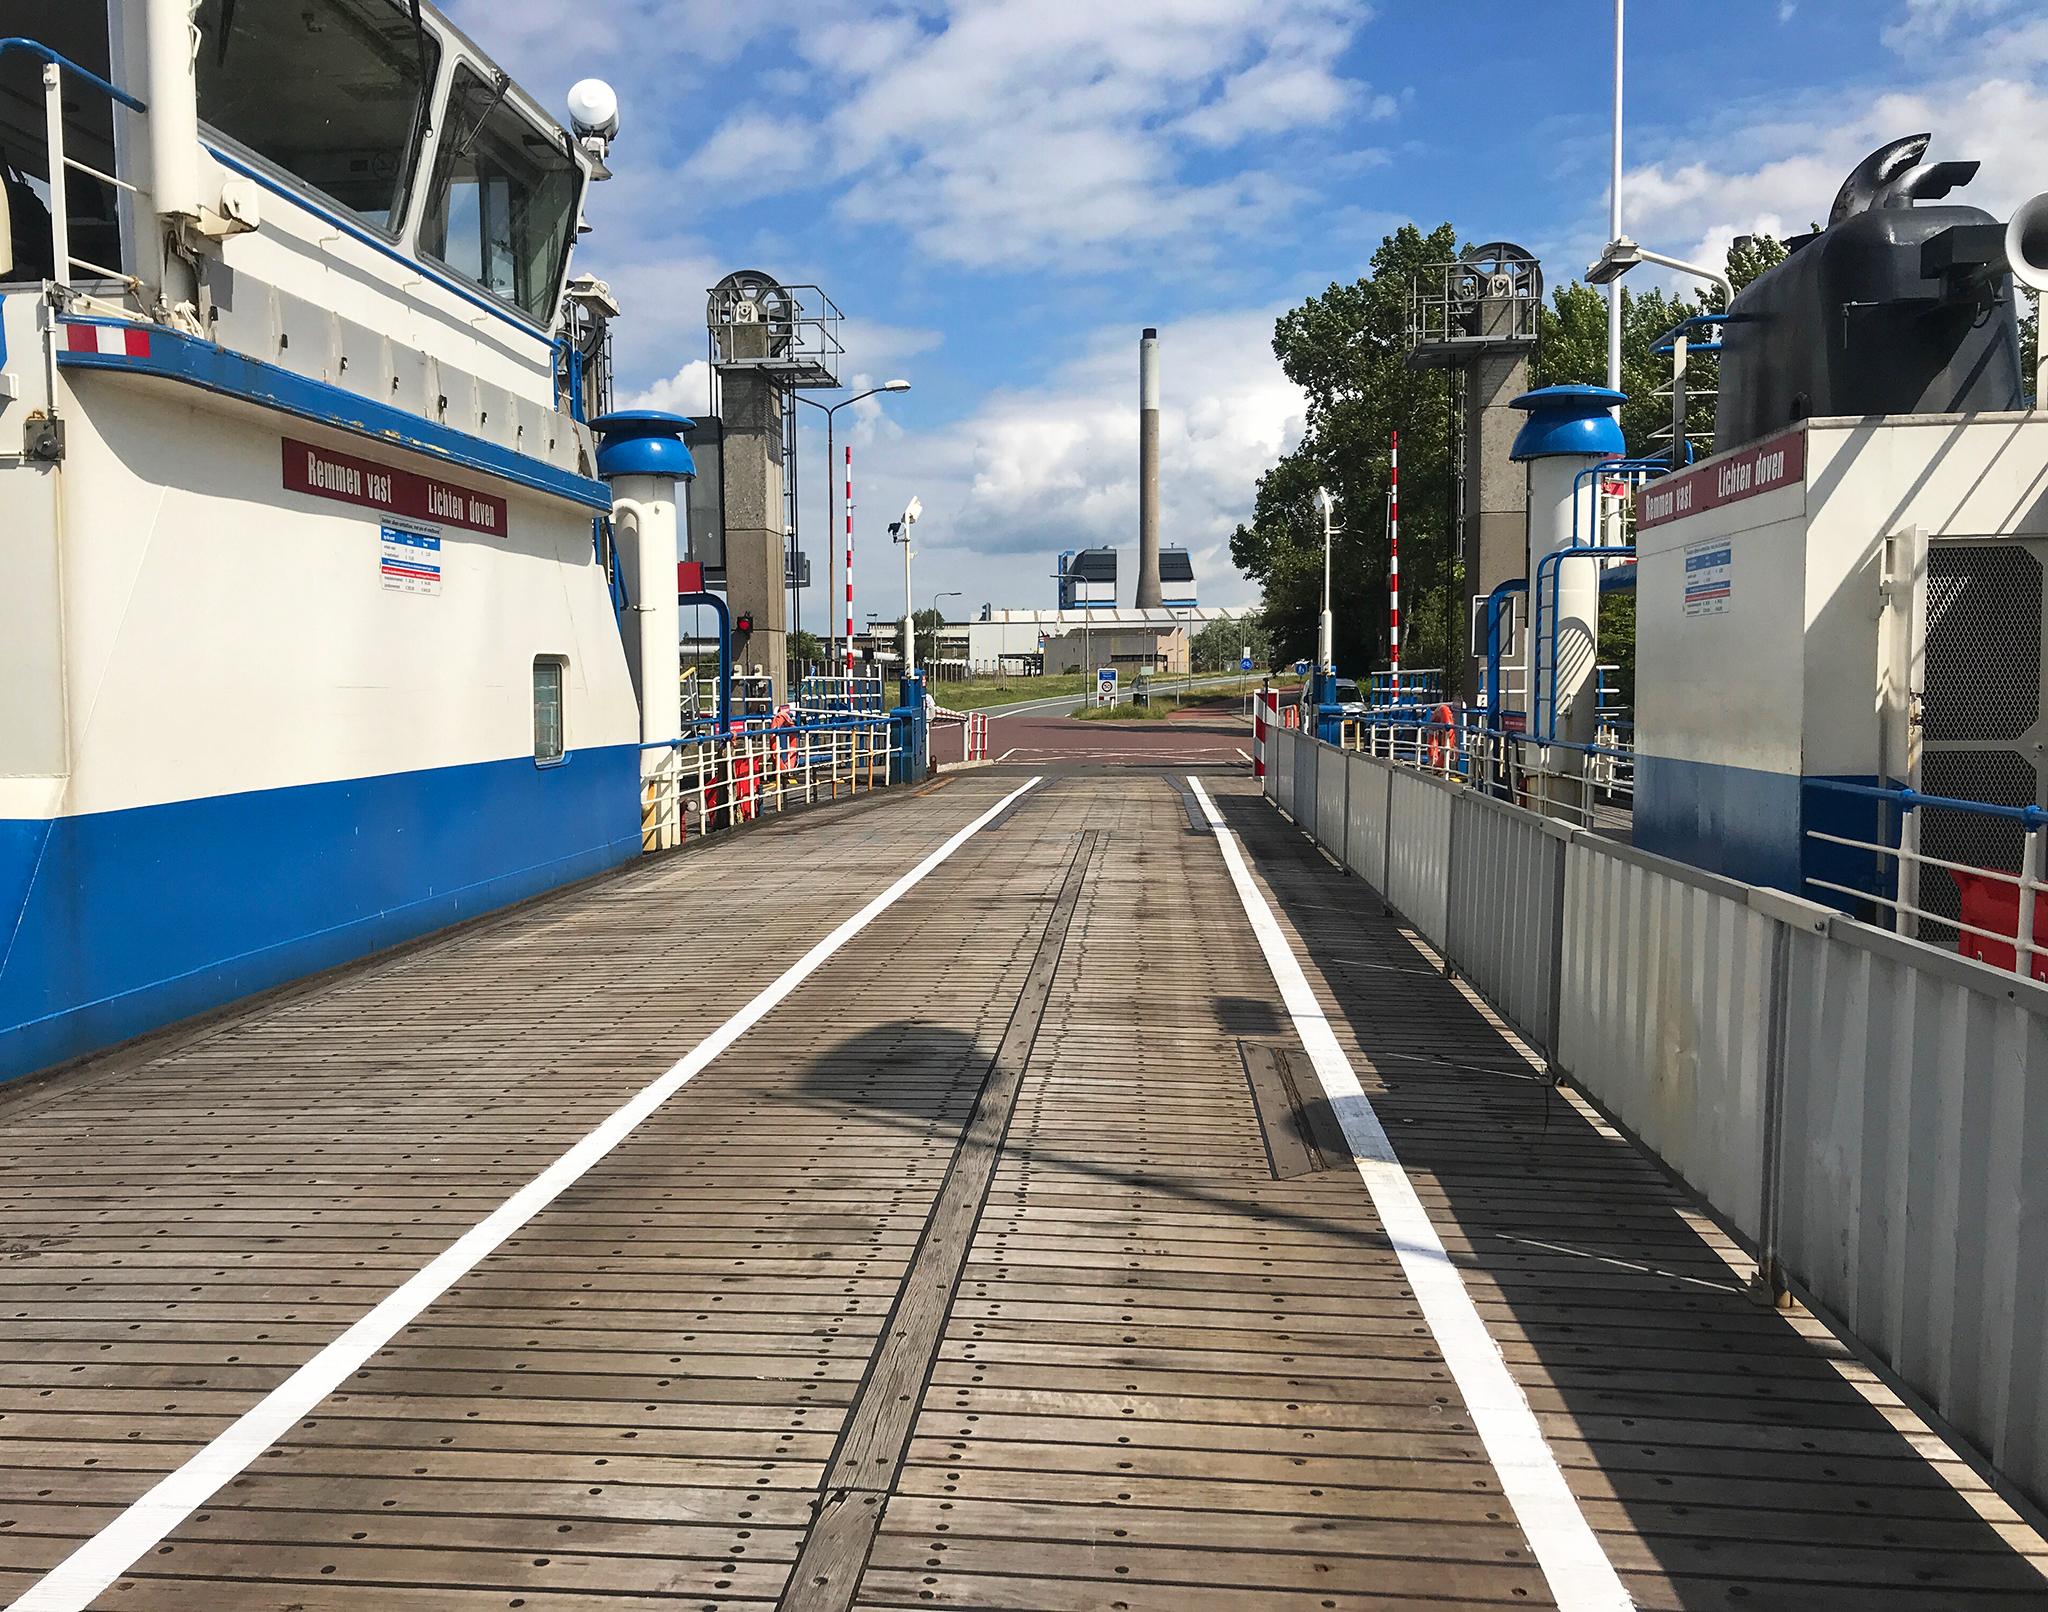 Velserpont ferry